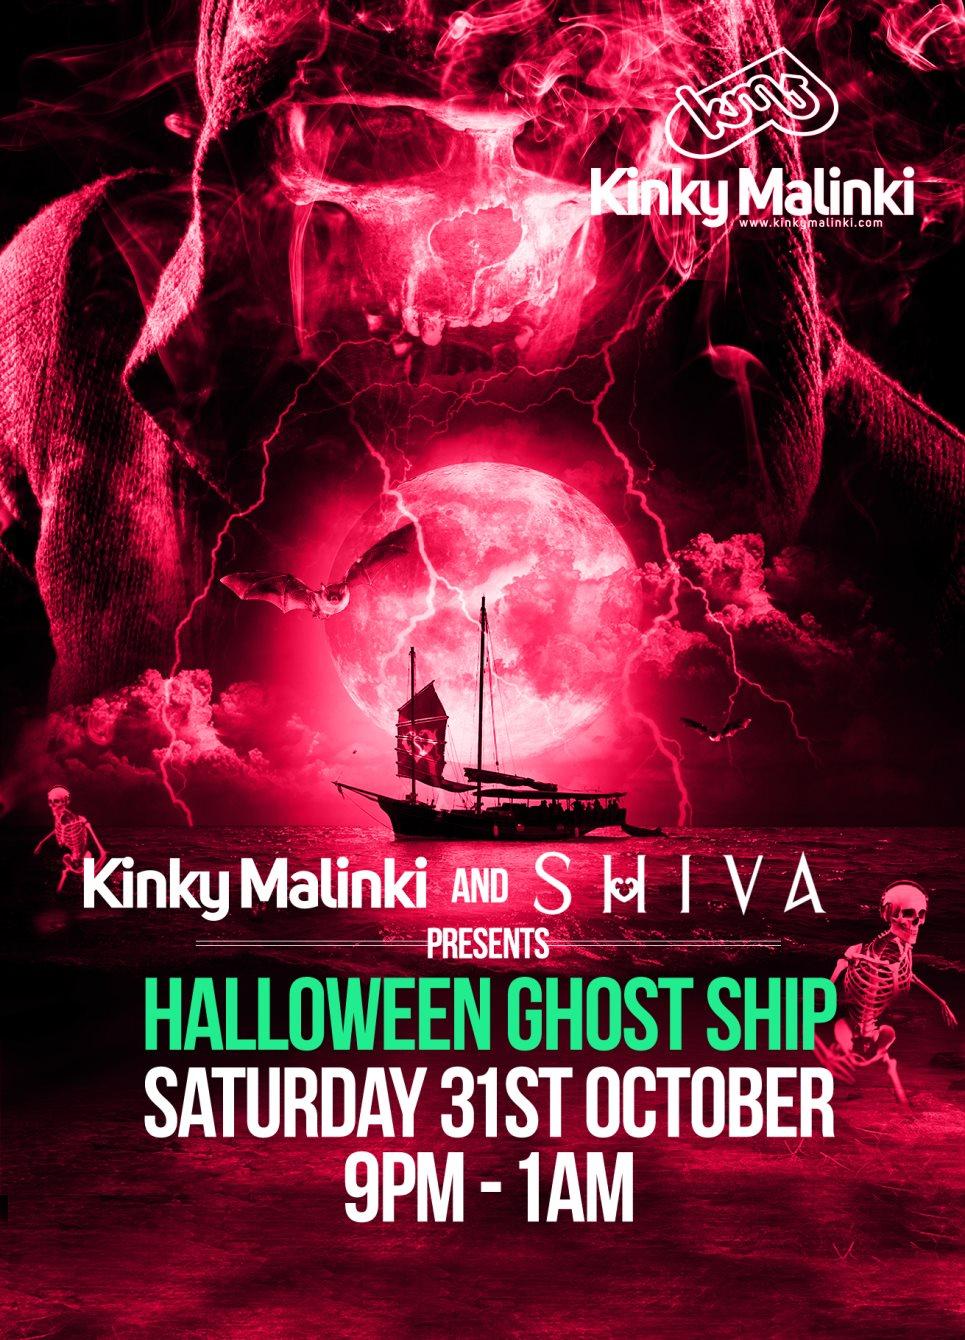 ra: kinky malinki & shiva halloween ghost ship at festival pier